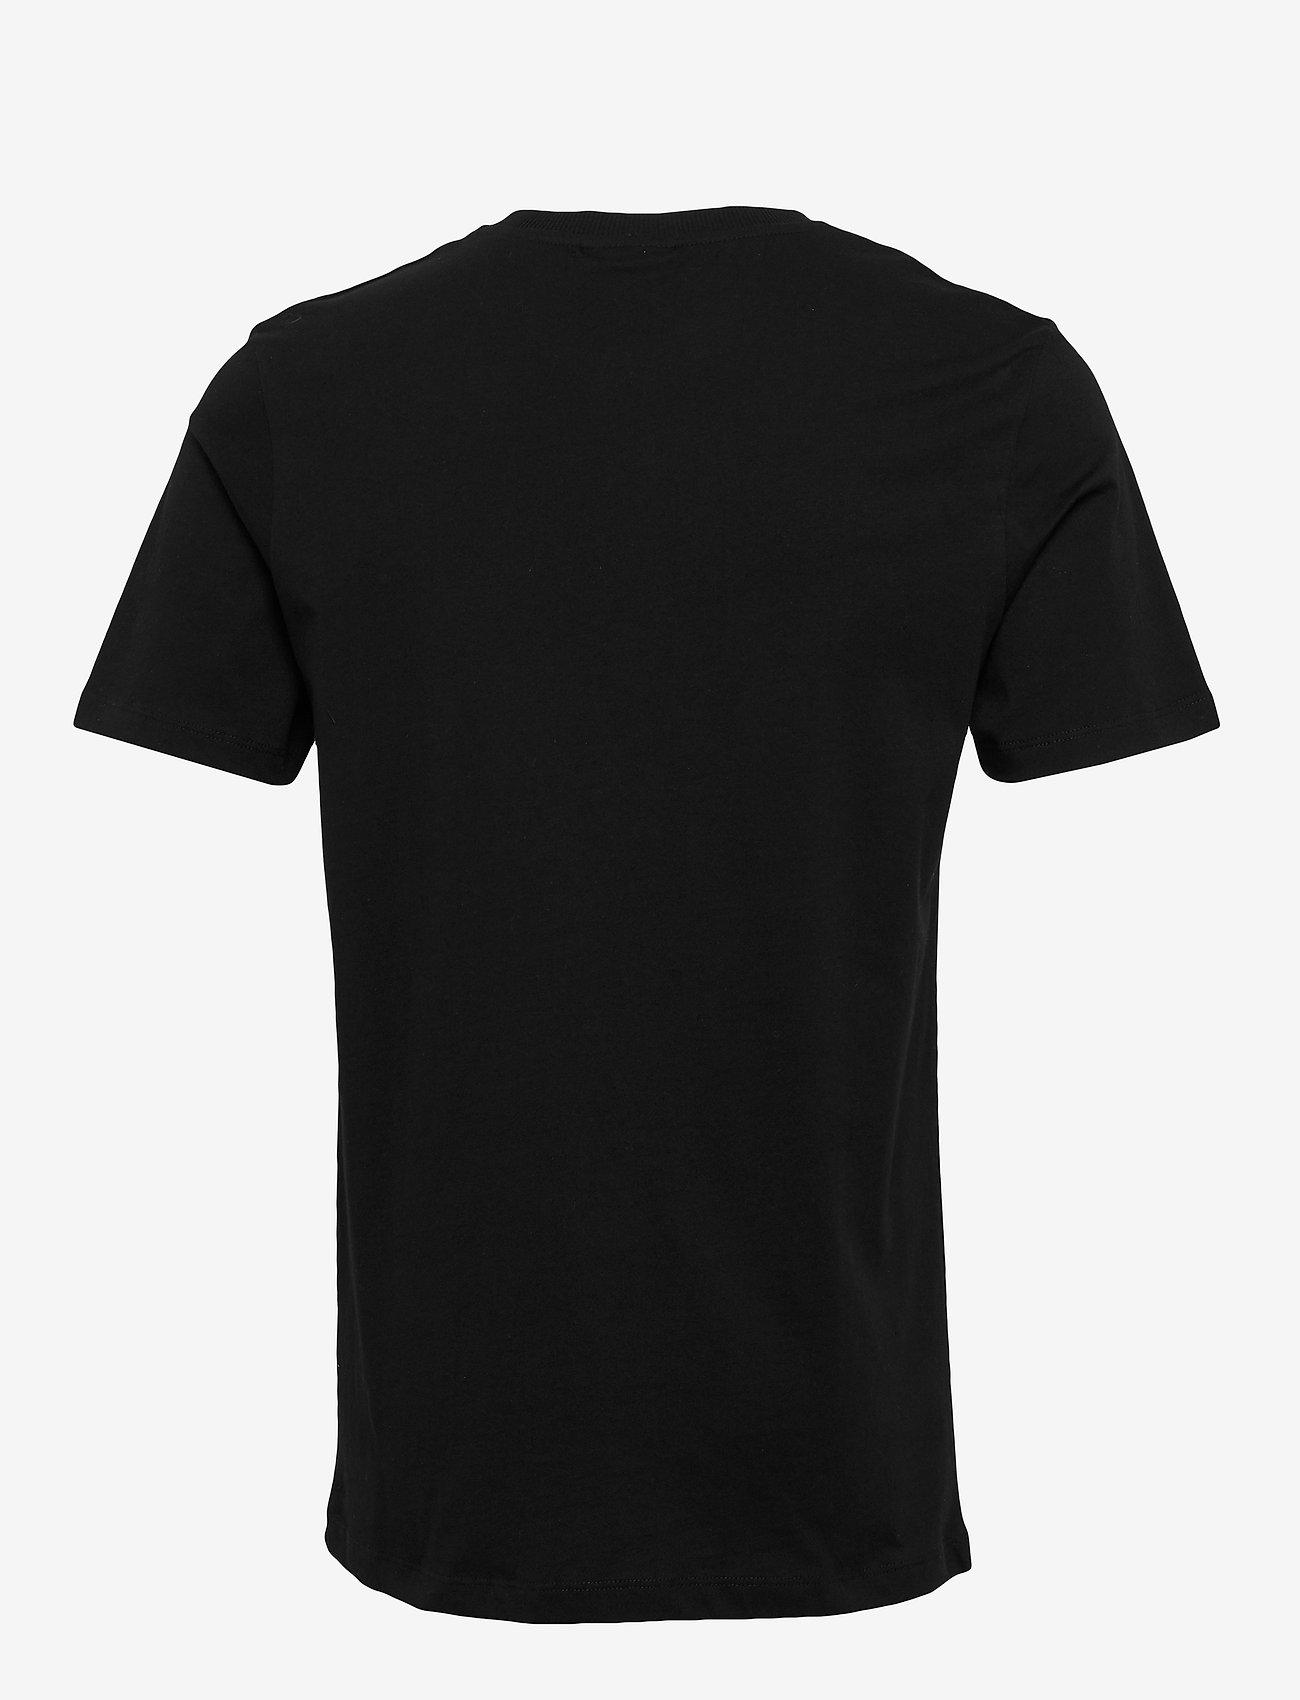 Soulland - LOGIC SALEH T-SHIRT W. PRINT - t-shirts - black